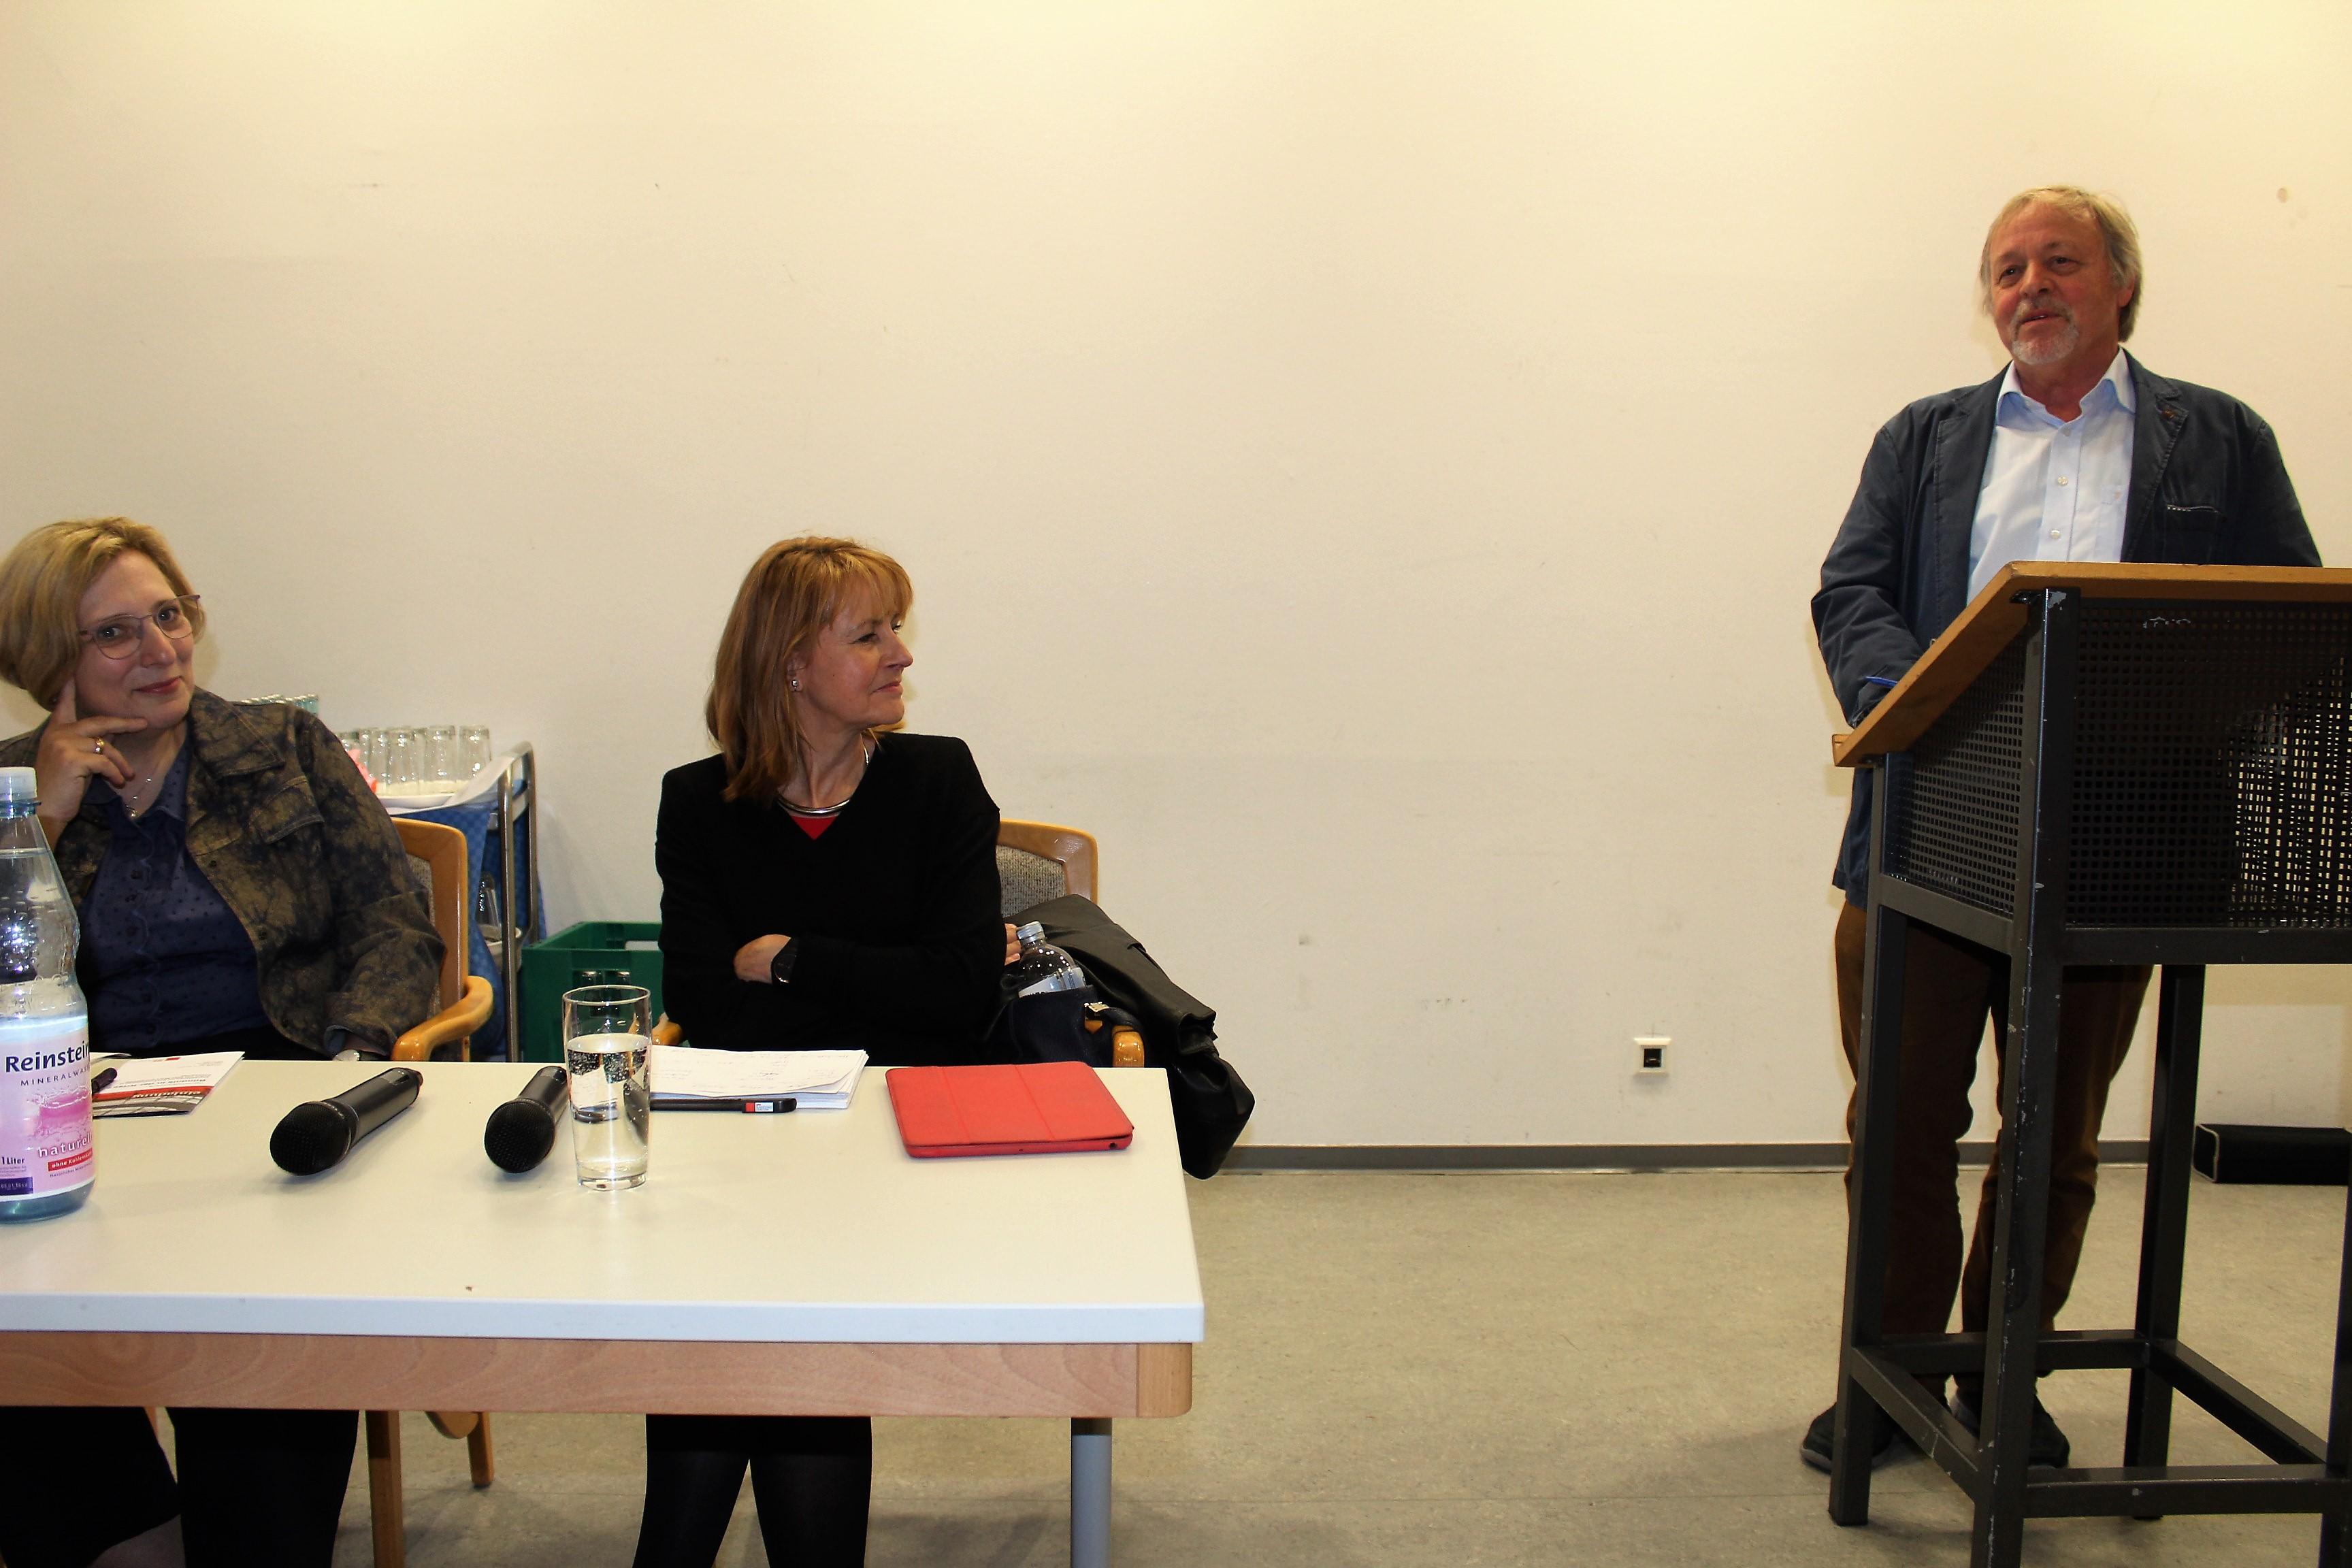 Dr. Daniela De Ridder, Dr. Edelgard Bulmahn und Bernhard Bendik bei der 'Fraktion vor Ort' (Foto: Johannes Franke)